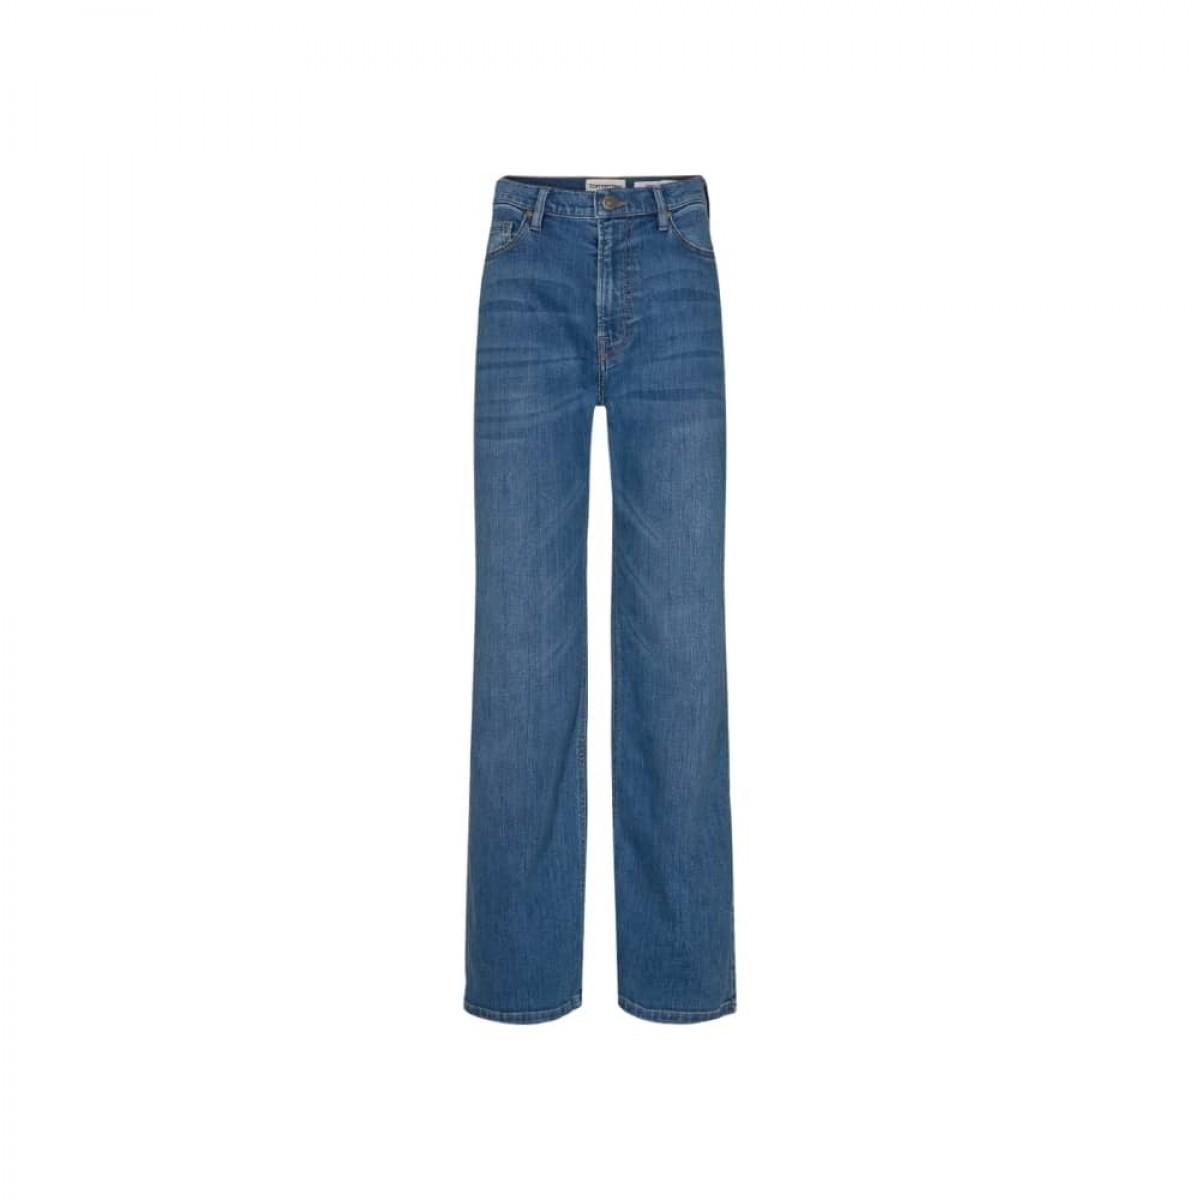 brown straight jeans - prato - denim blue - front